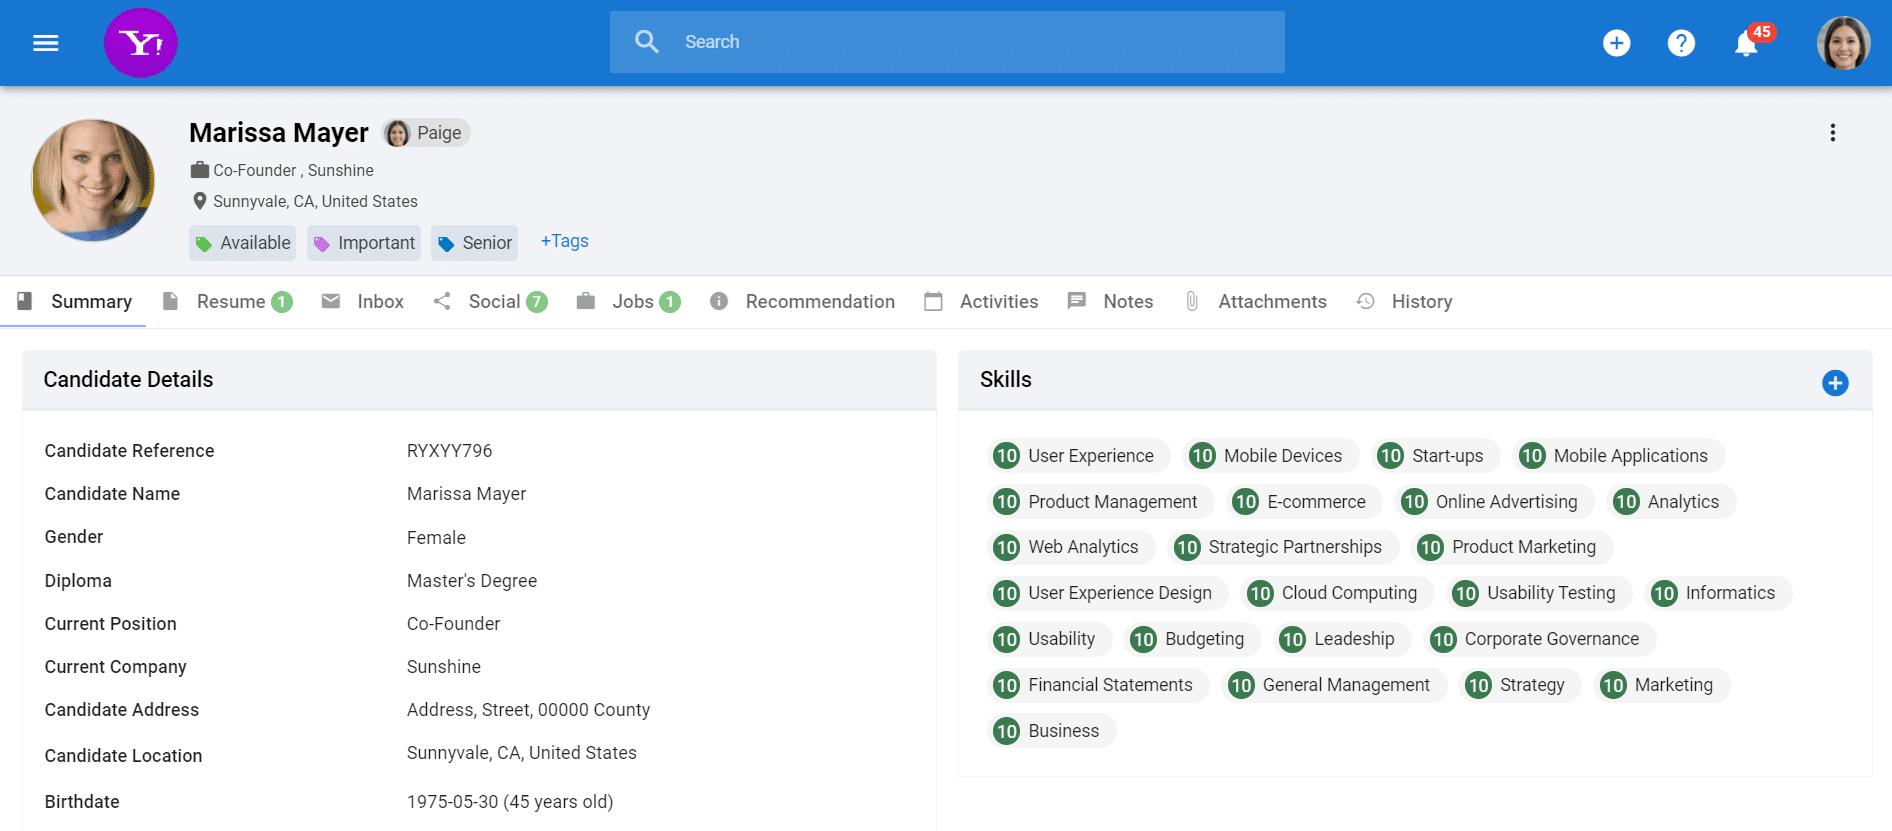 Manatal Software - Holistic Candidate Profiles